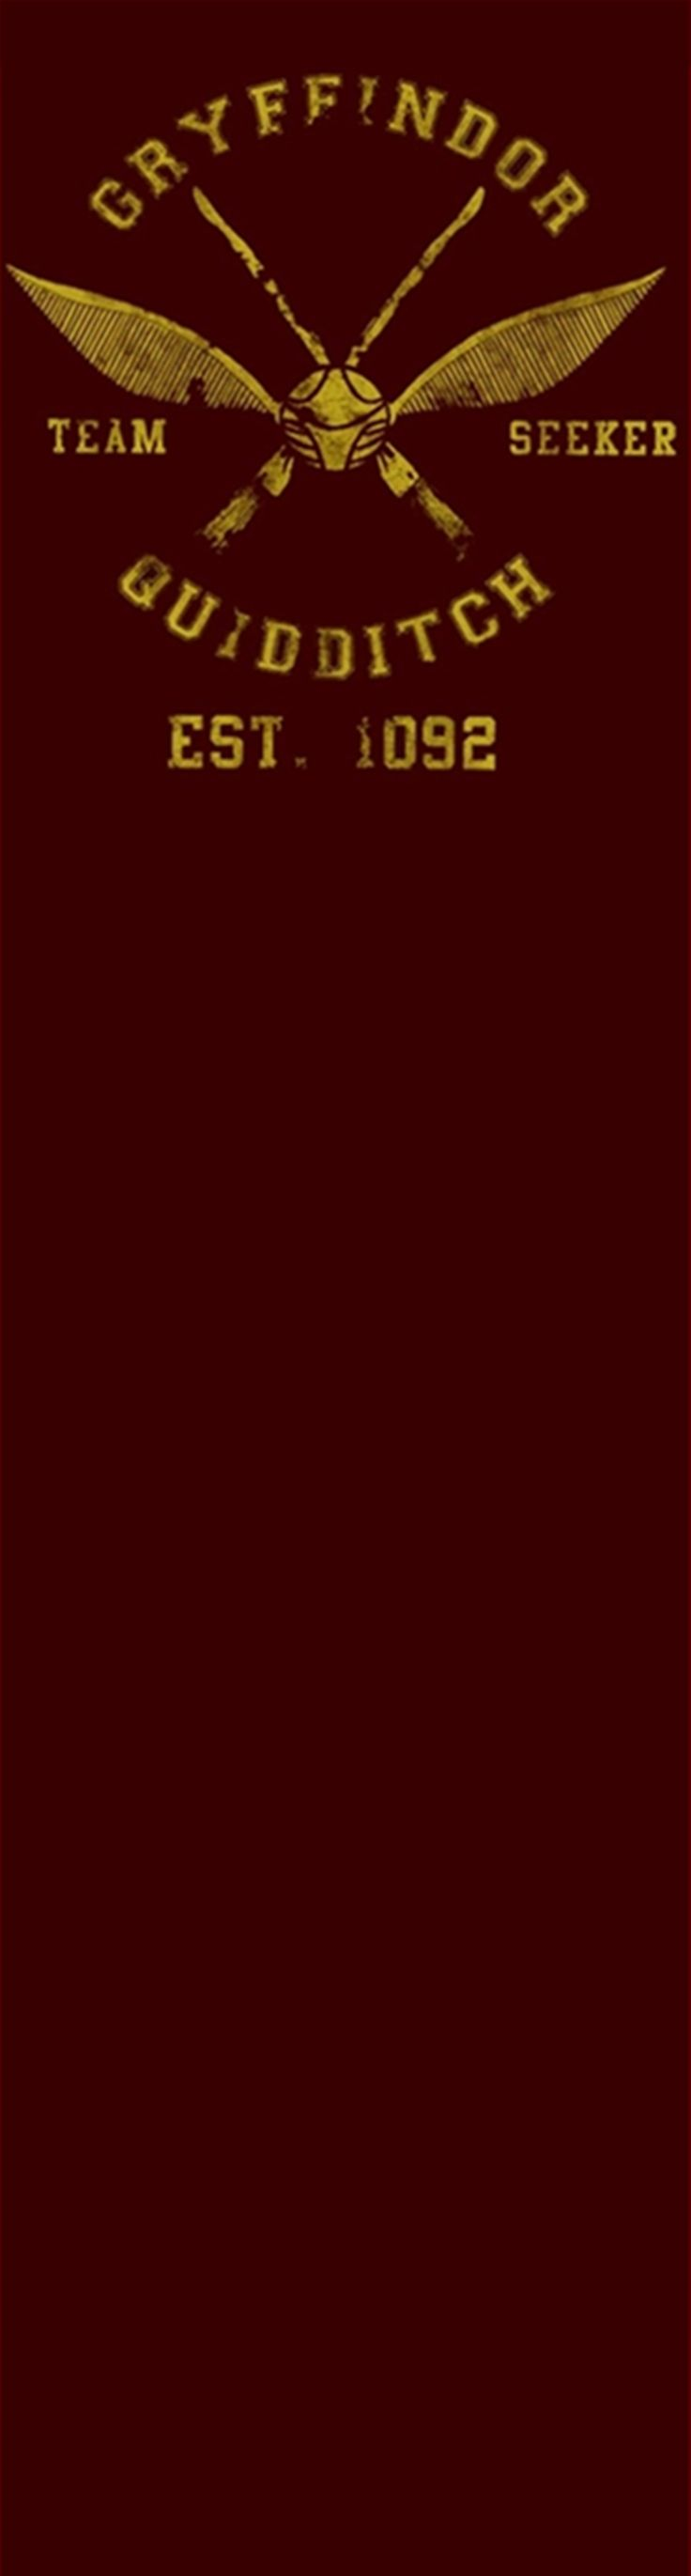 Amazing Wallpaper Harry Potter Apple - 9a5f1e86194a0d4f58118db1109634a2  Graphic_502093.jpg